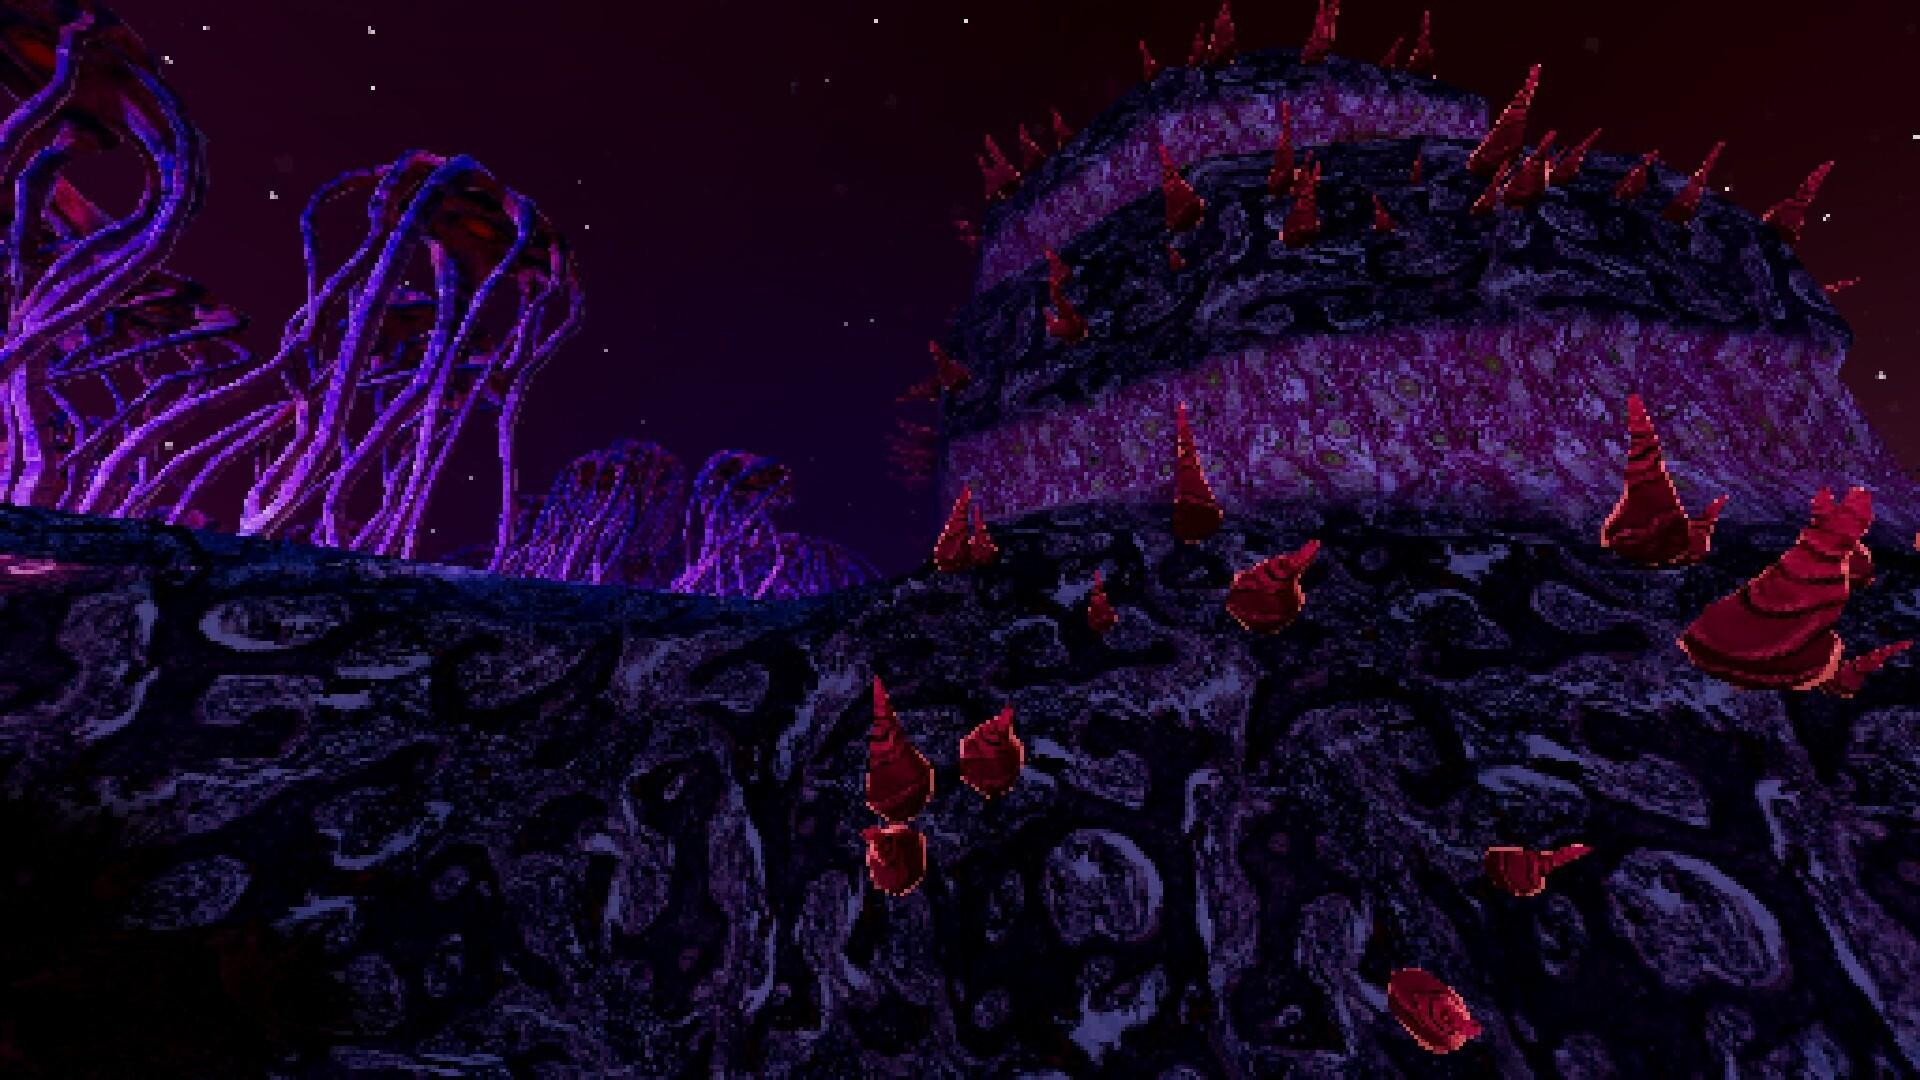 Stars Die game screenshot 2, weird environments